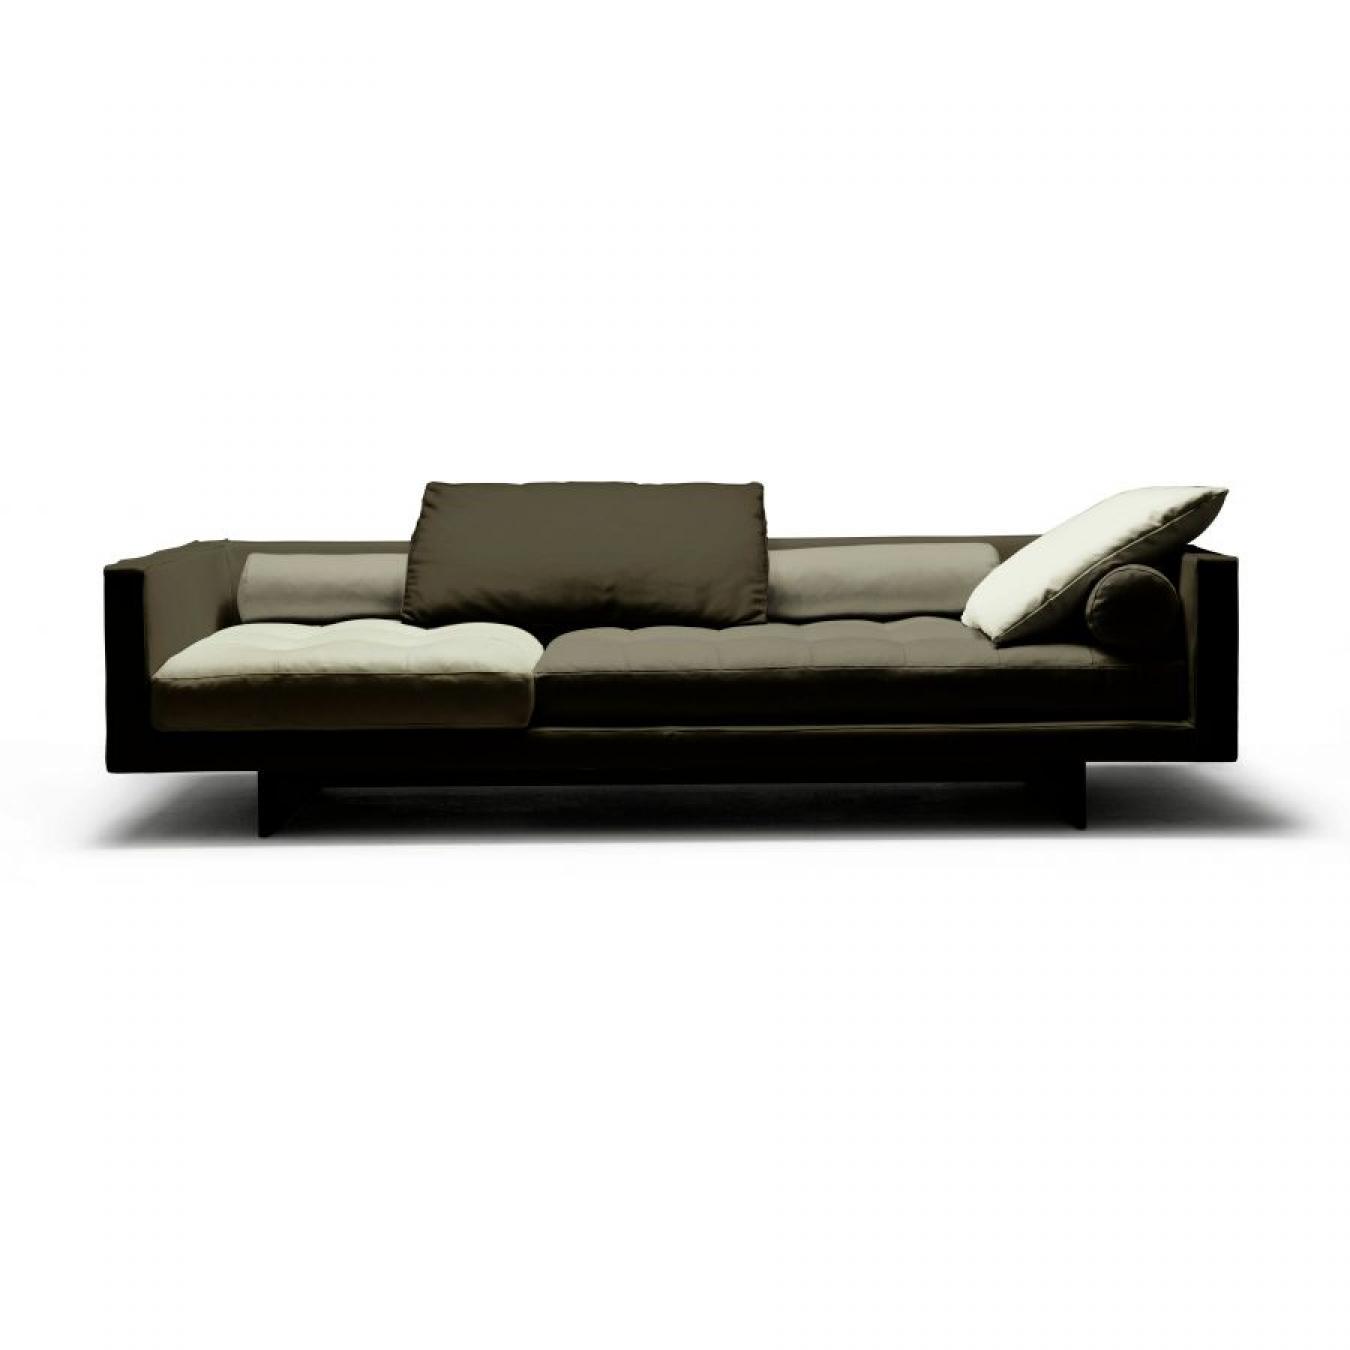 photos canap moderne. Black Bedroom Furniture Sets. Home Design Ideas